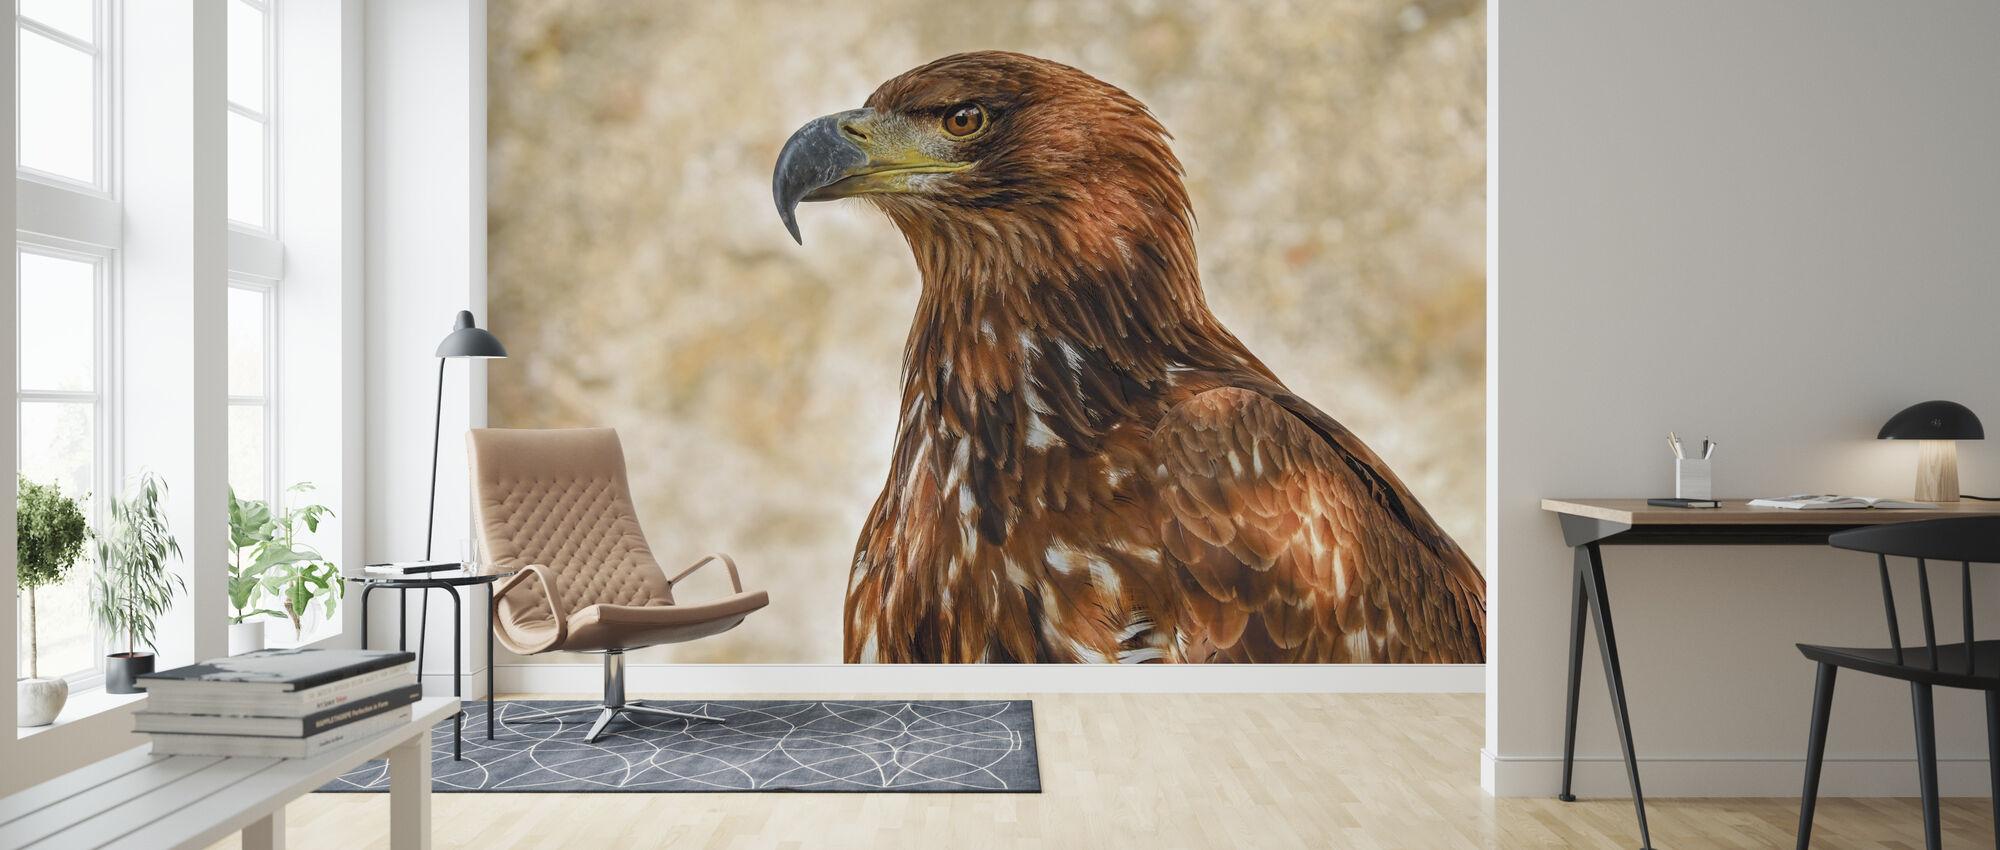 Bird of Prey - Wallpaper - Living Room